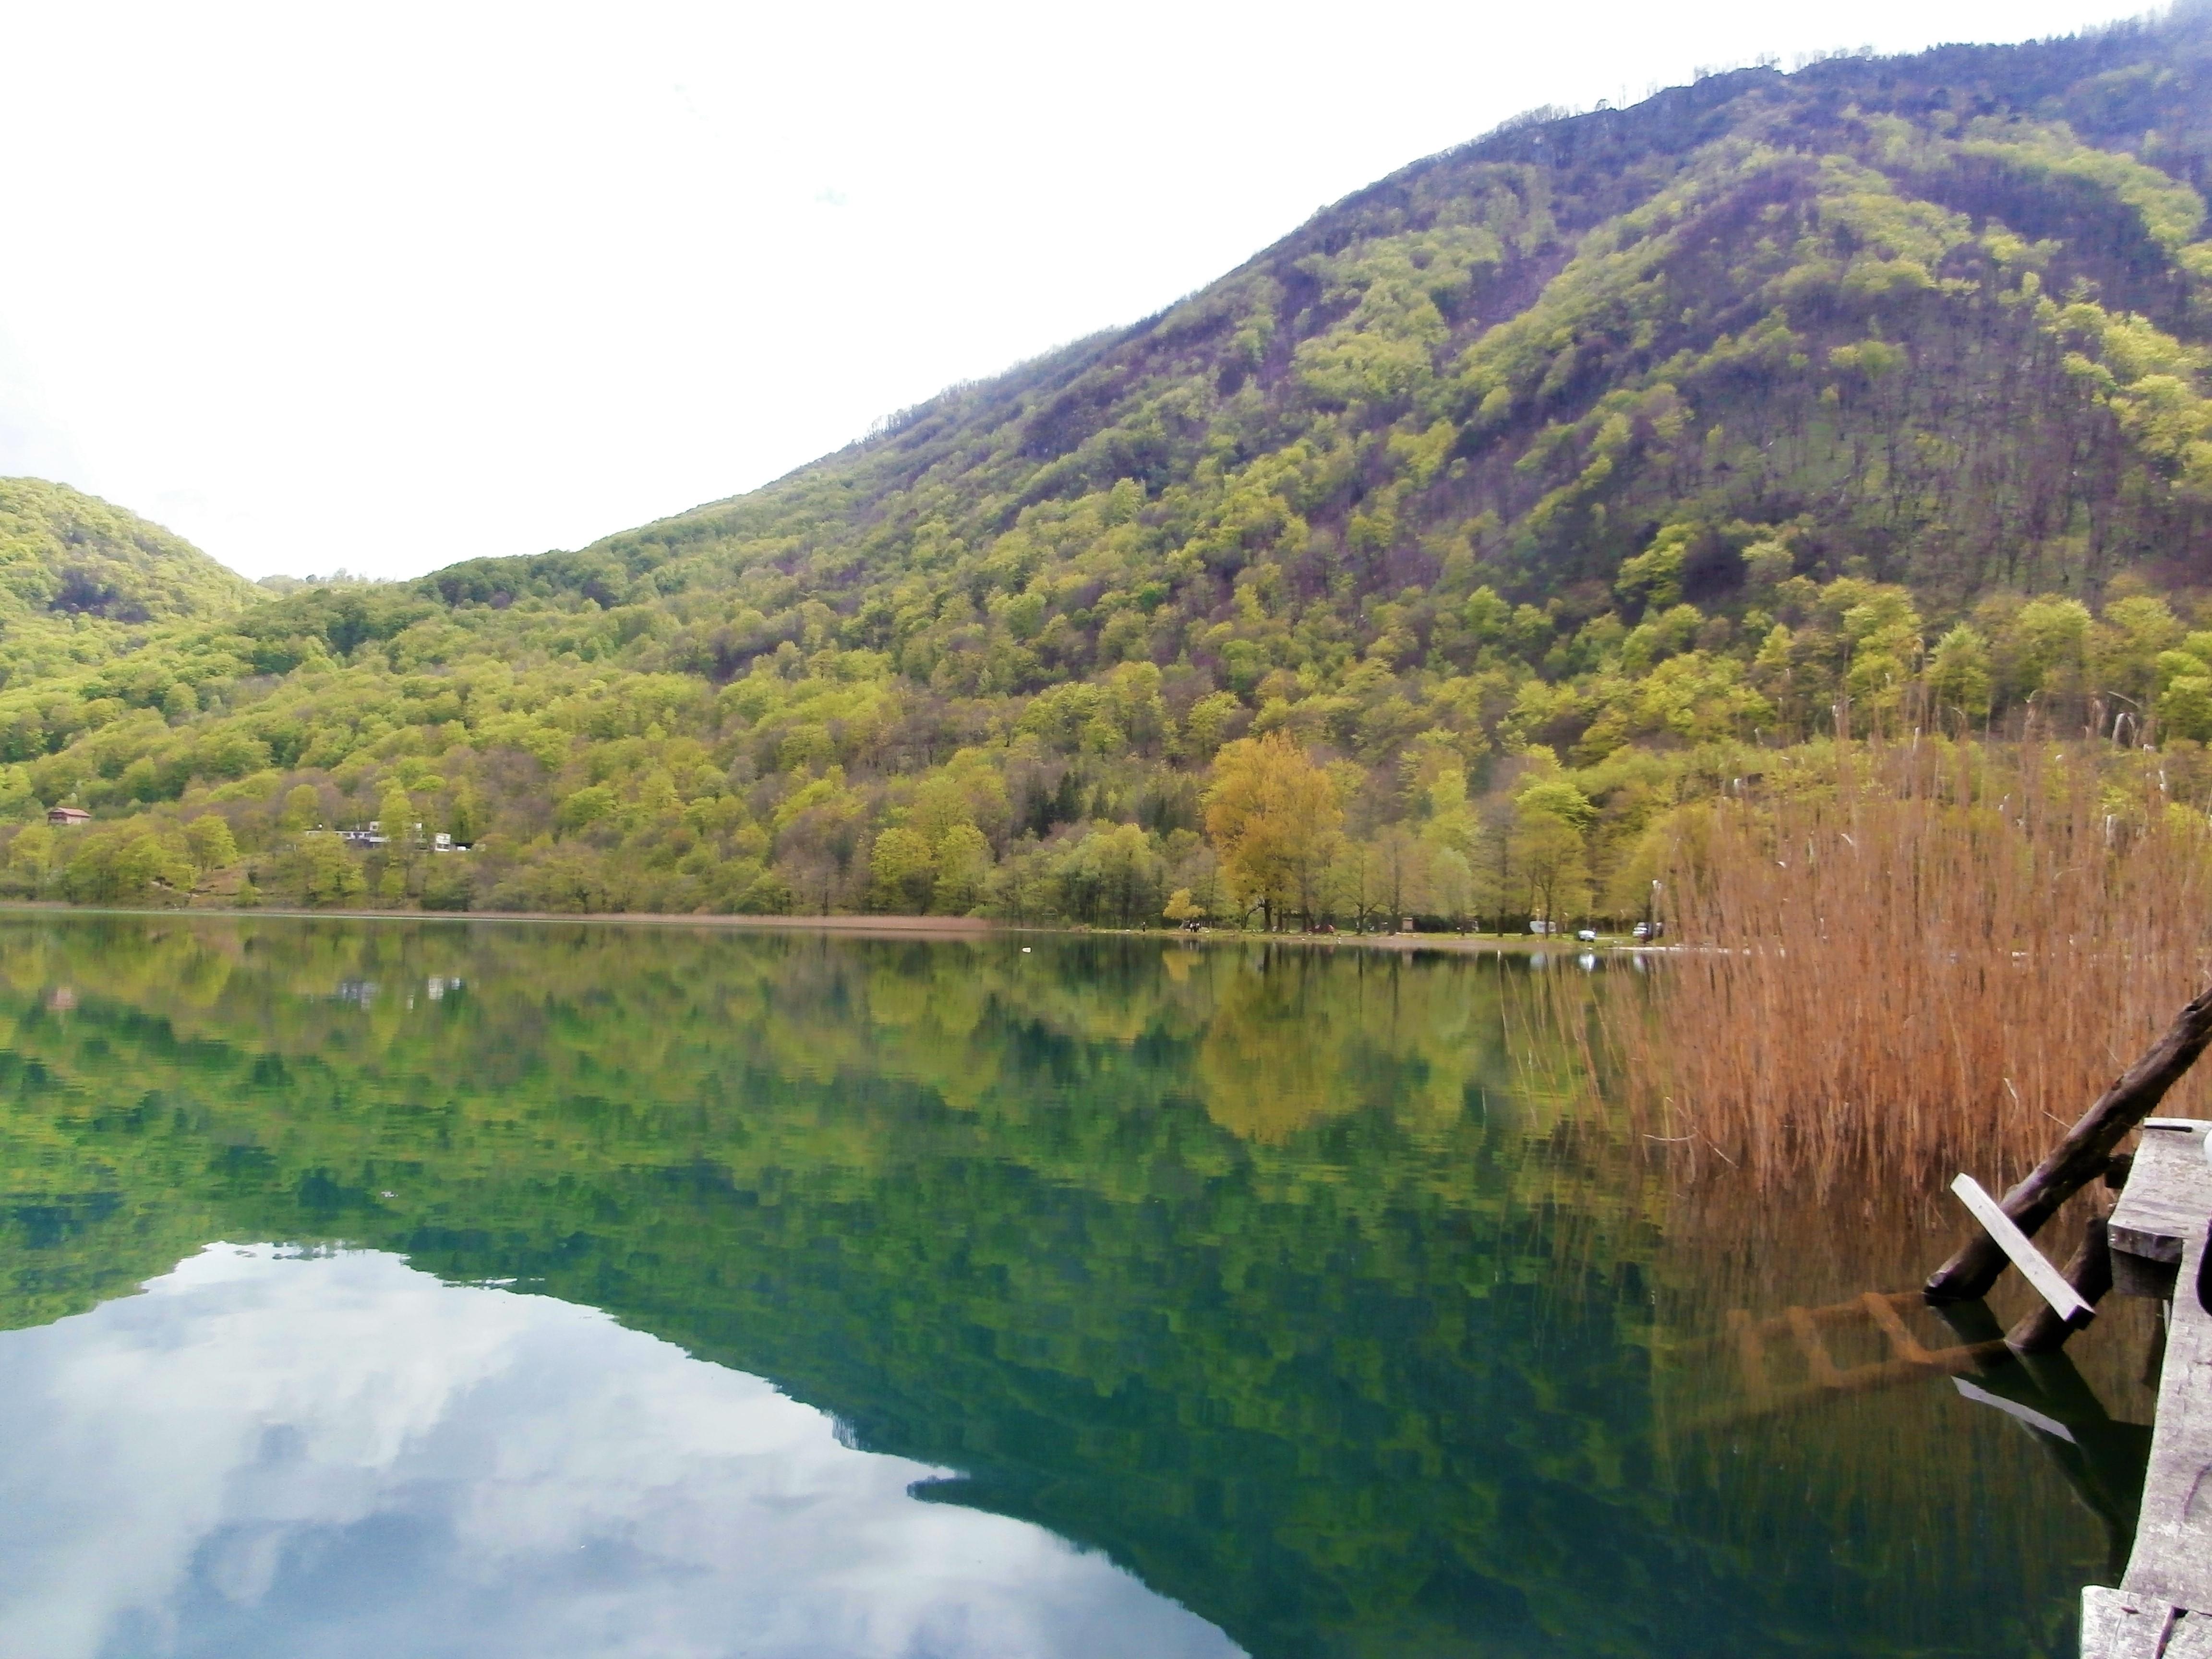 Boračko Lake hitchhiking Sarajevo Mostar Konjic Bosnia and Herzegovina BiH jetty reflection mountains forest